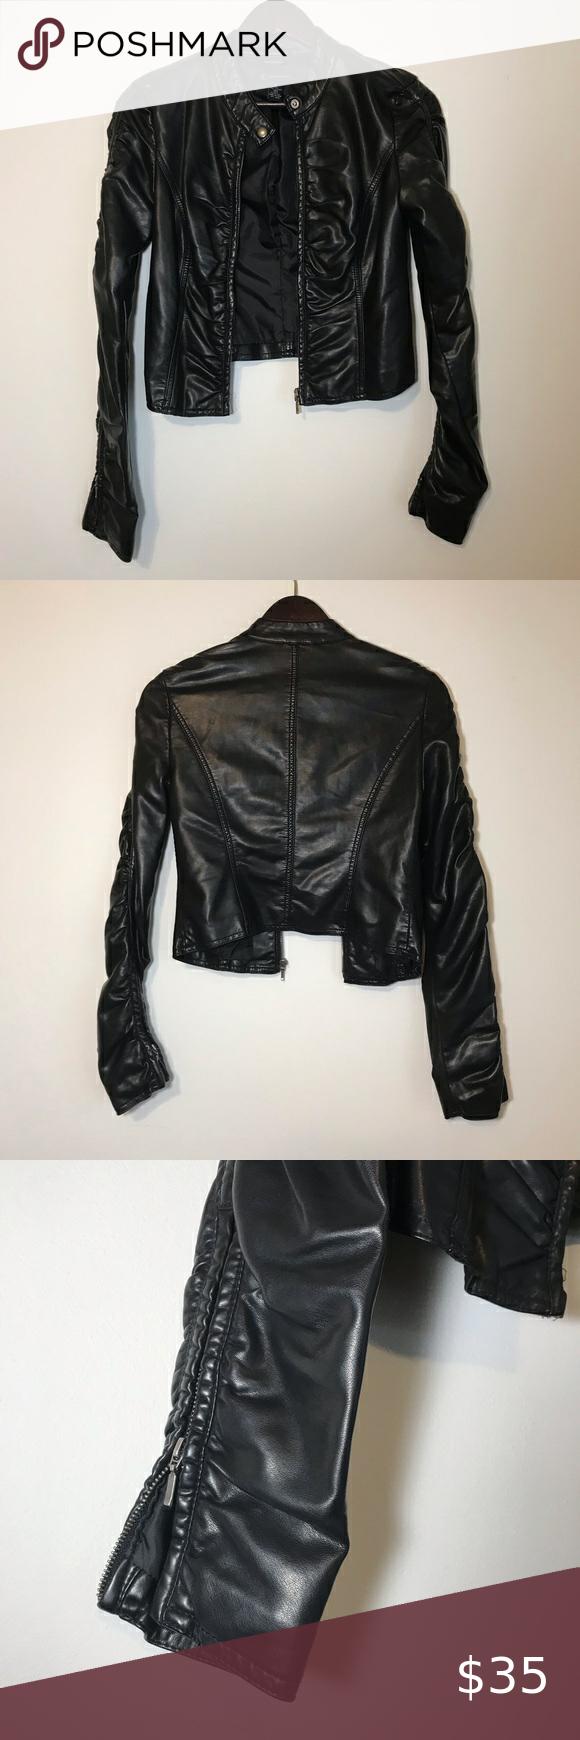 Inc Leather Crop Jacket Xs Crop Jacket Jackets Clothes Design [ 1740 x 580 Pixel ]